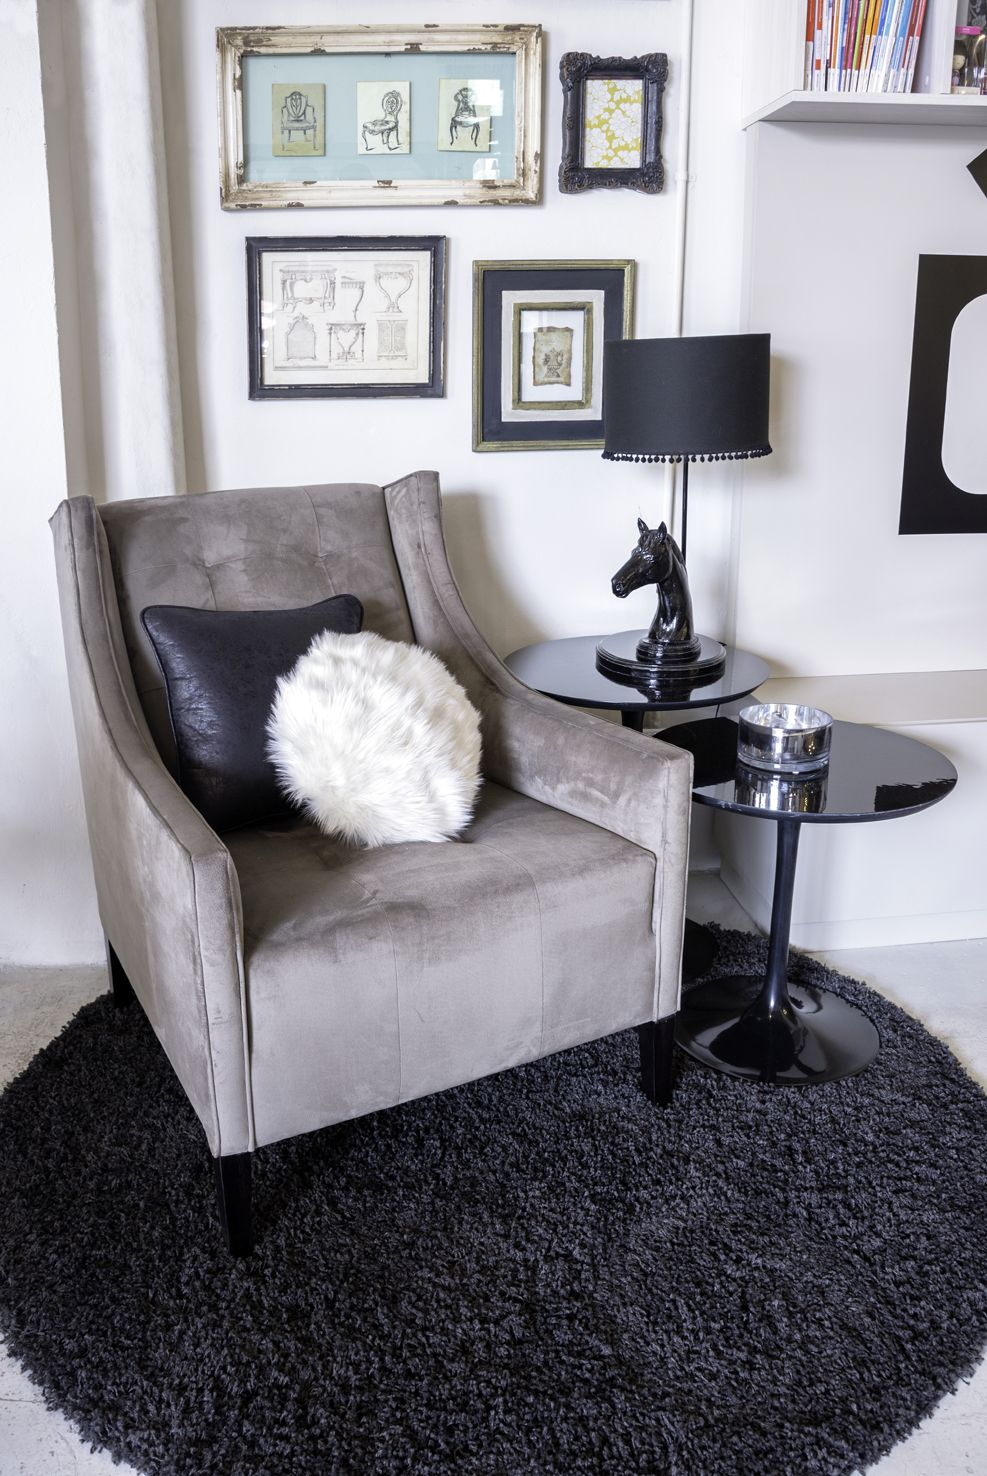 Desde una c moda butaca tapizada hasta mesas auxiliares modernas pasando por cuadros antiguos - Butacas comodas ...